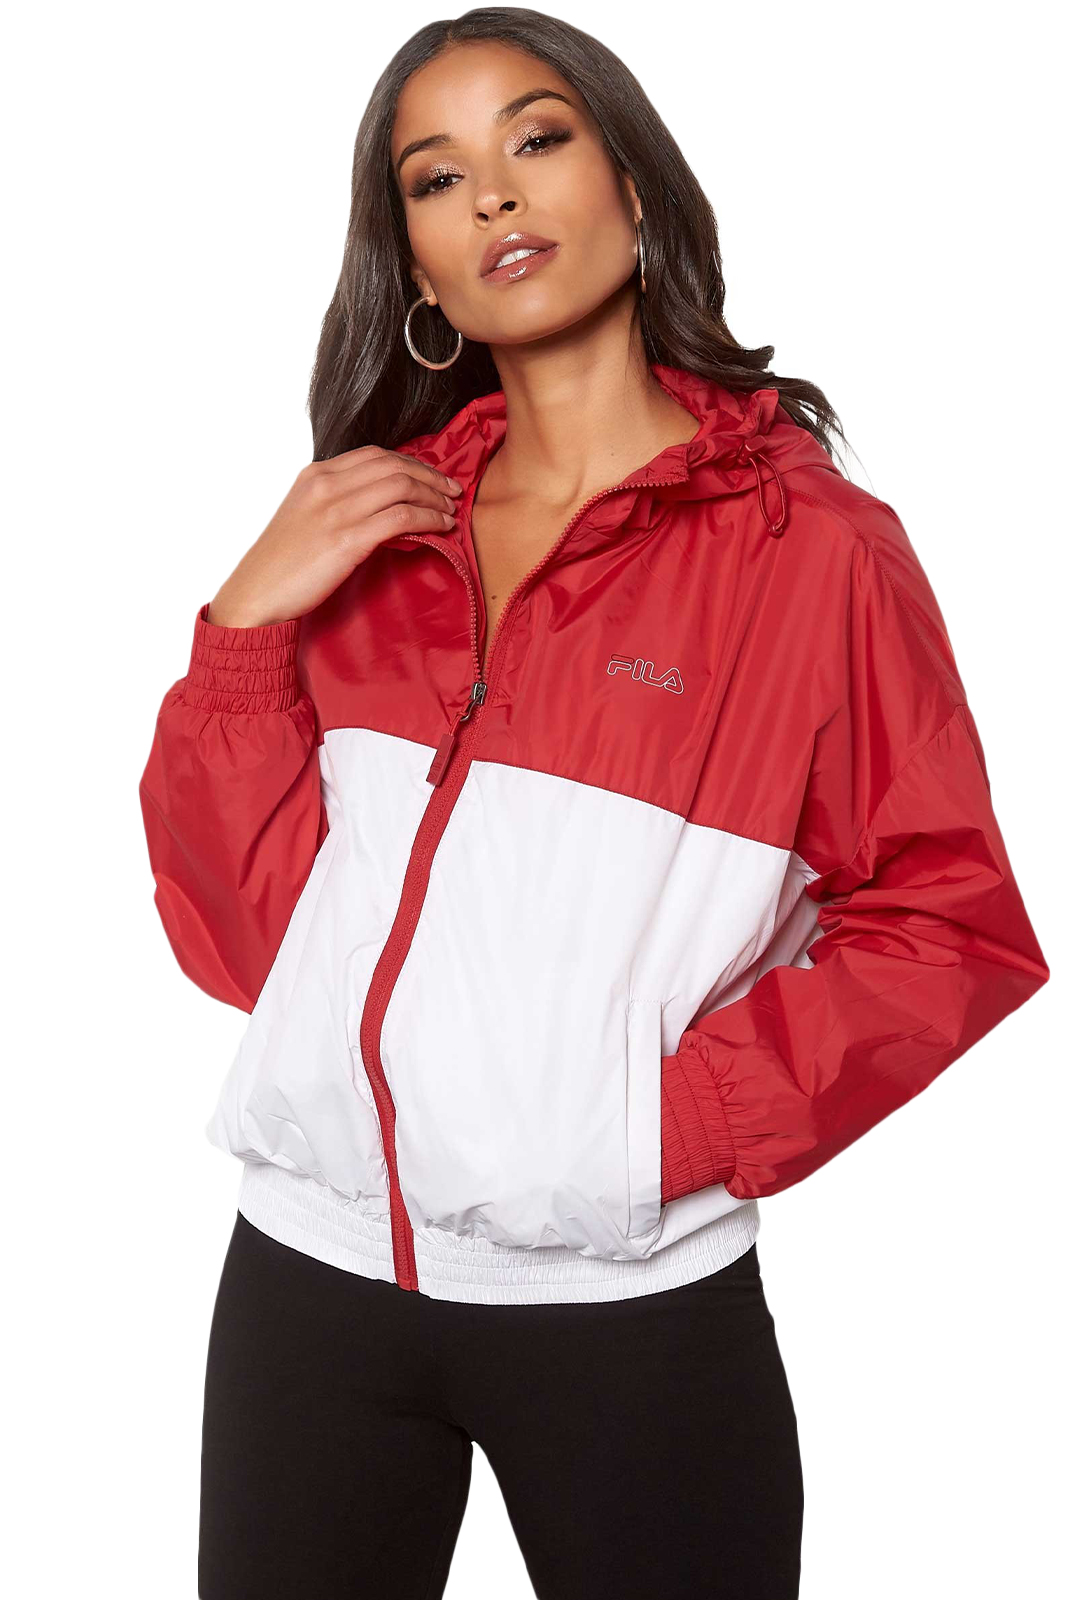 Sweat / sweat zippé  Fila 687148 RAY G12 true red-bright white